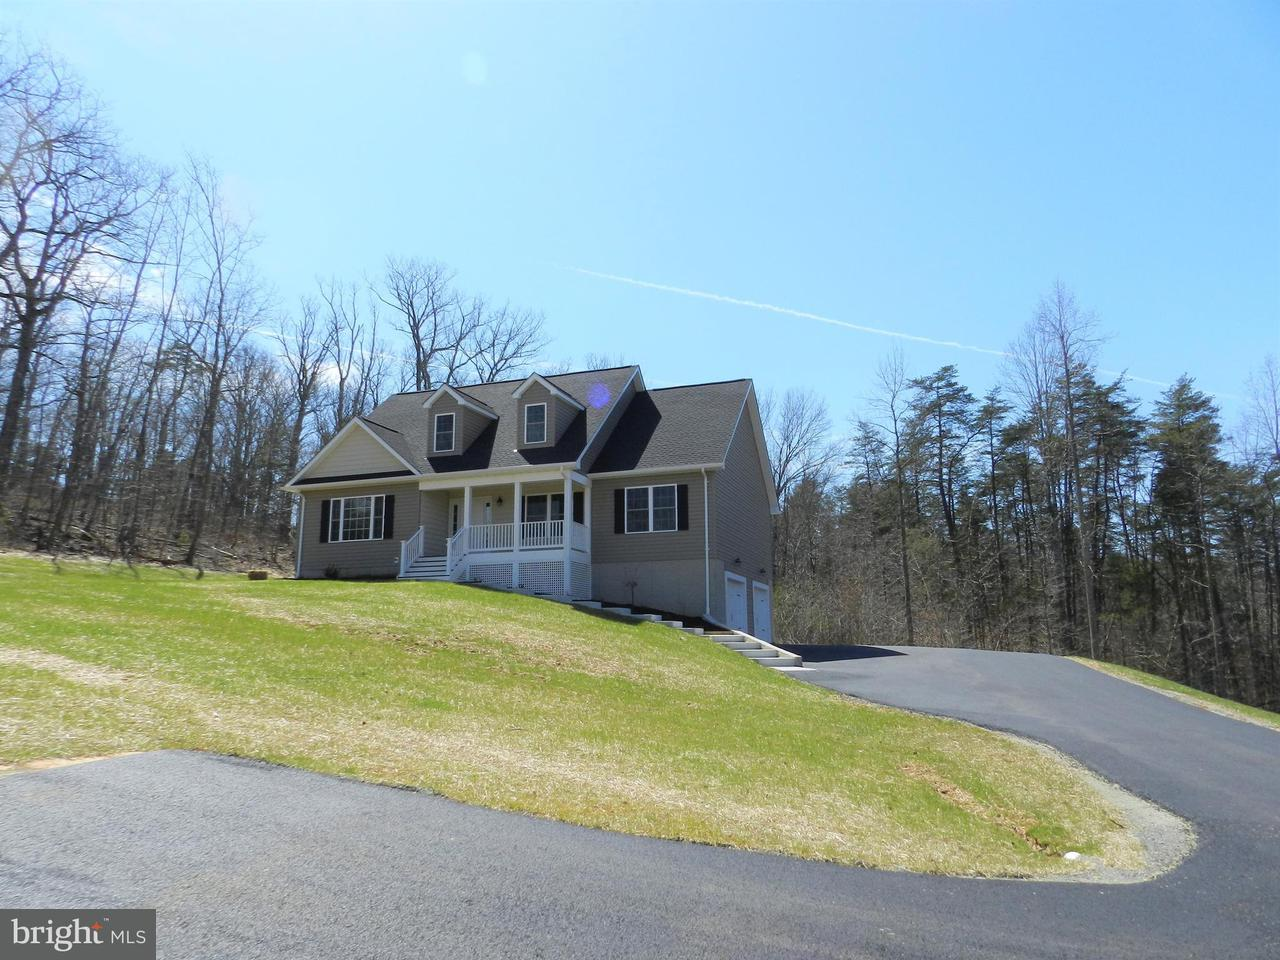 Single Family Home for Sale at 7548 Sarahs Way 7548 Sarahs Way Culpeper, Virginia 22701 United States